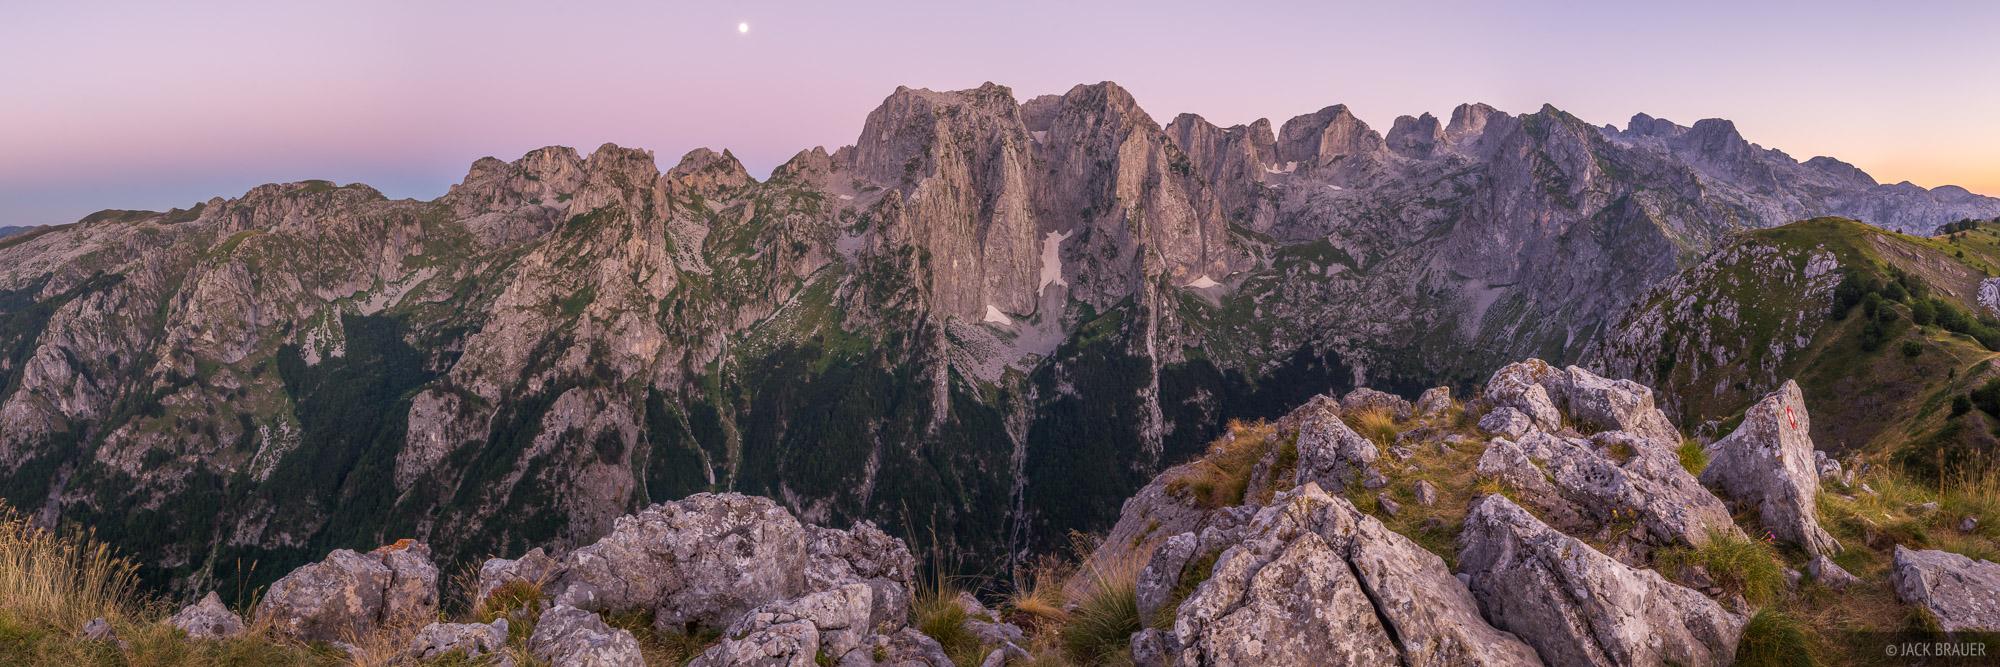 Grebaje Valley,Karanfili,Montenegro,Prokletije, panorama